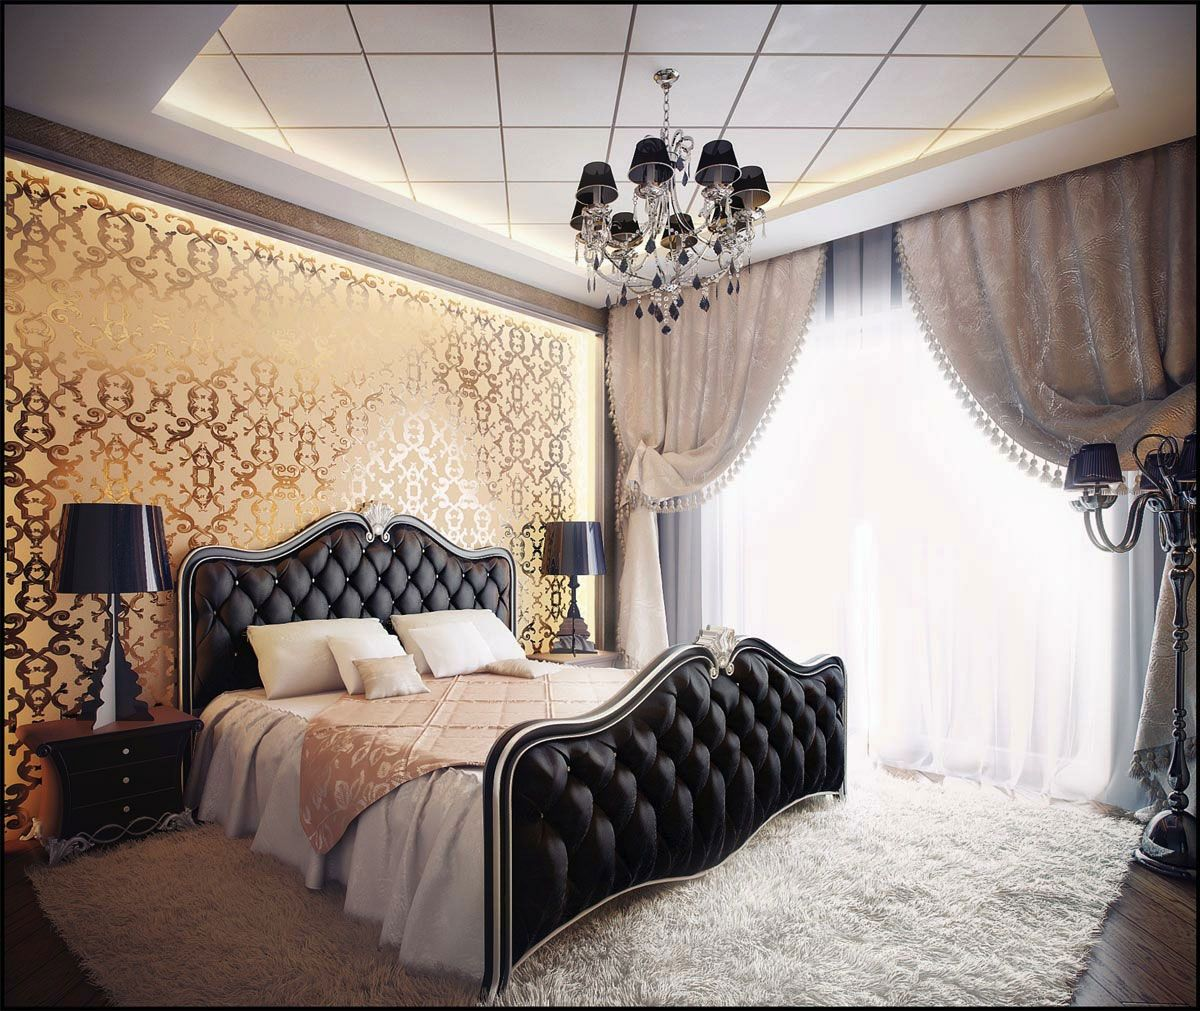 Bedroom Design Elegant Romantic Bedroom Design With Traditional